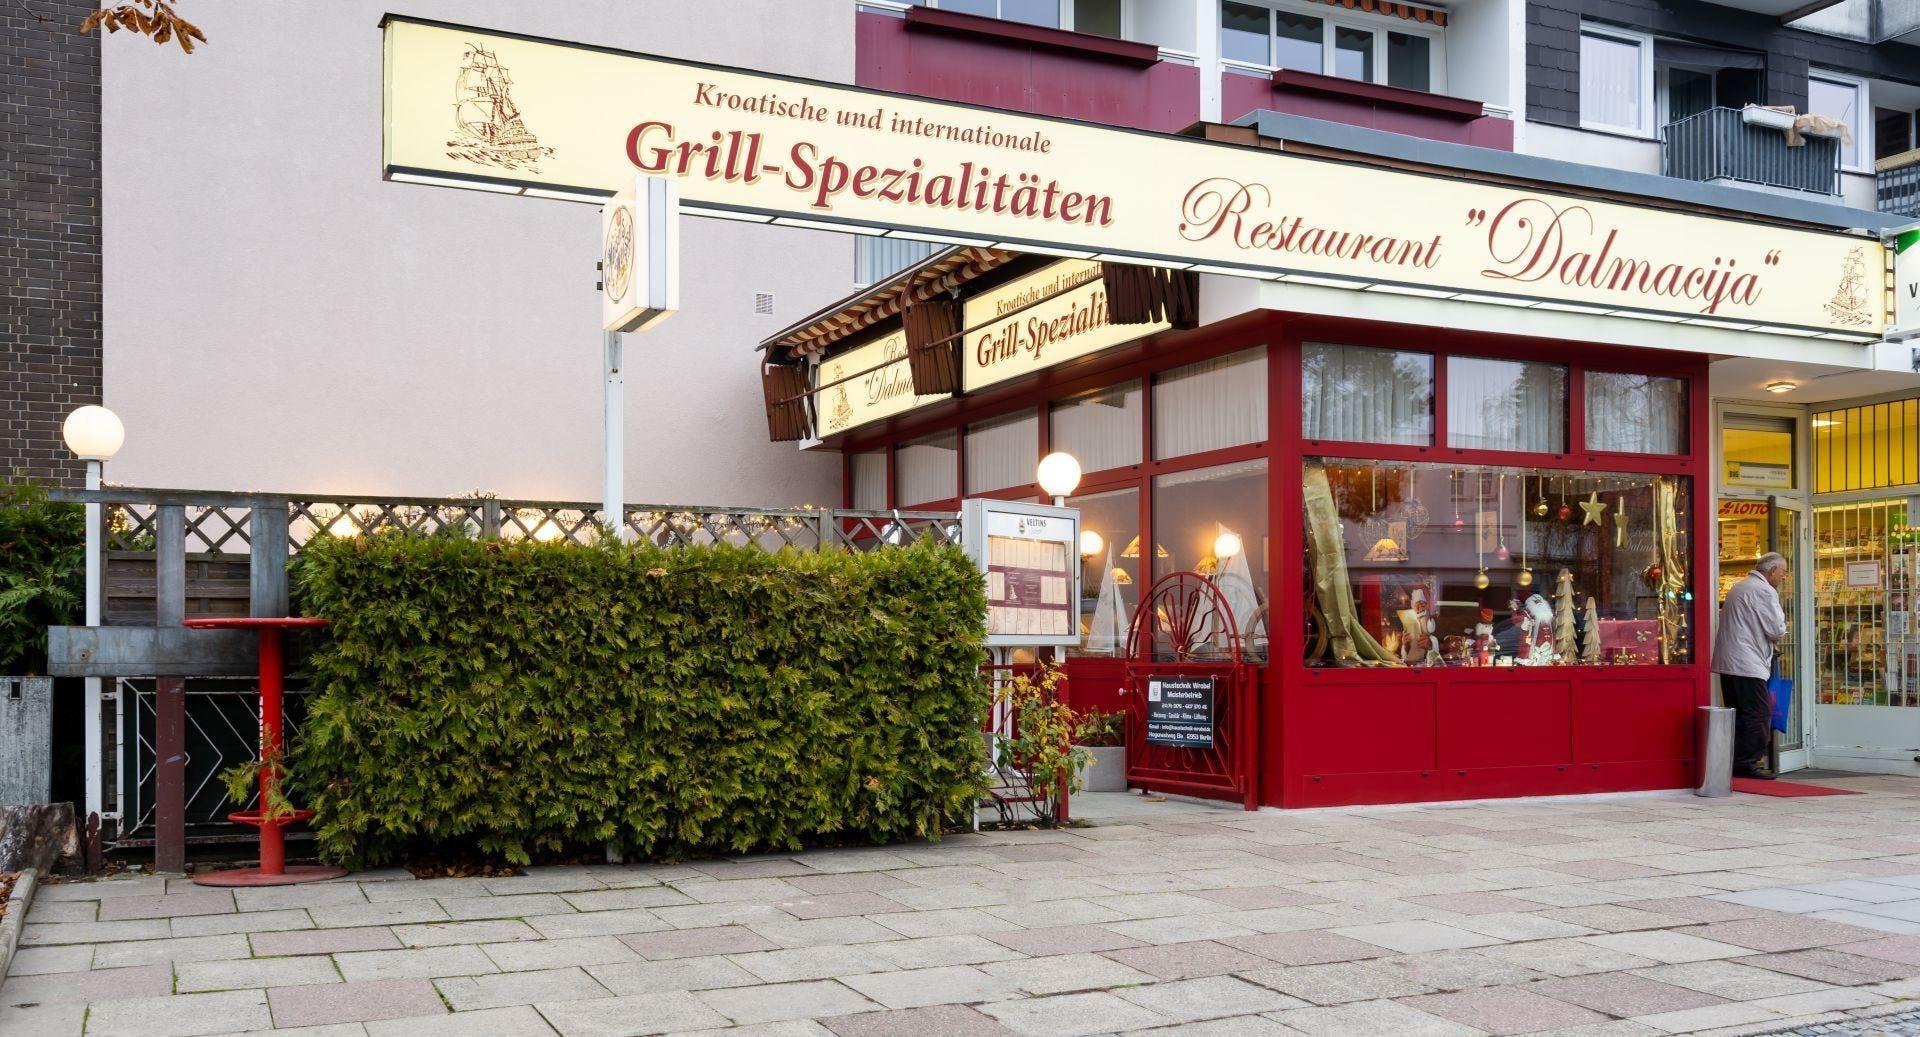 Dalmacija Restaurant